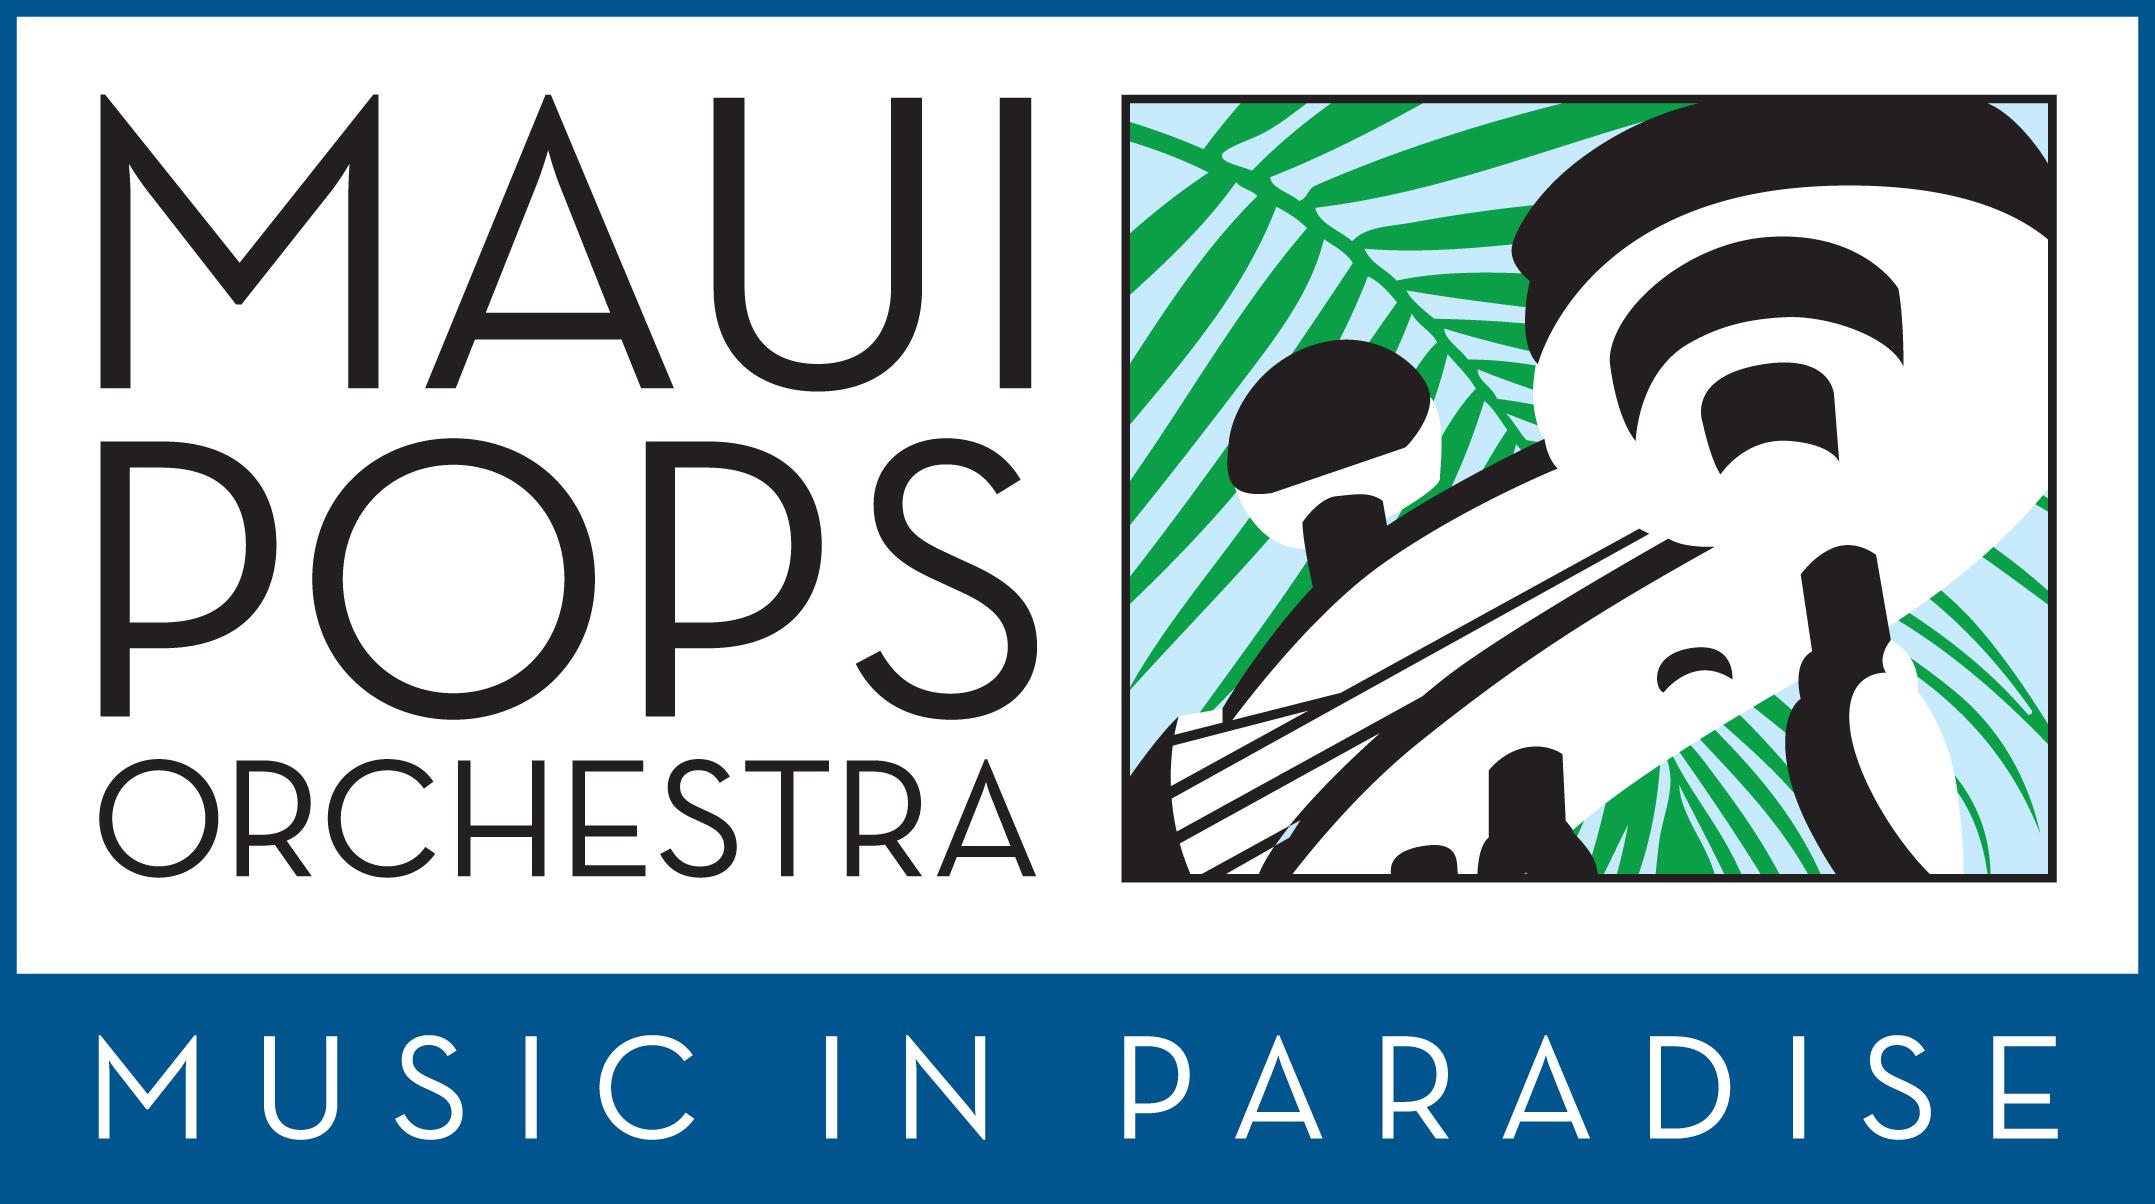 Maui Pops Orchestra